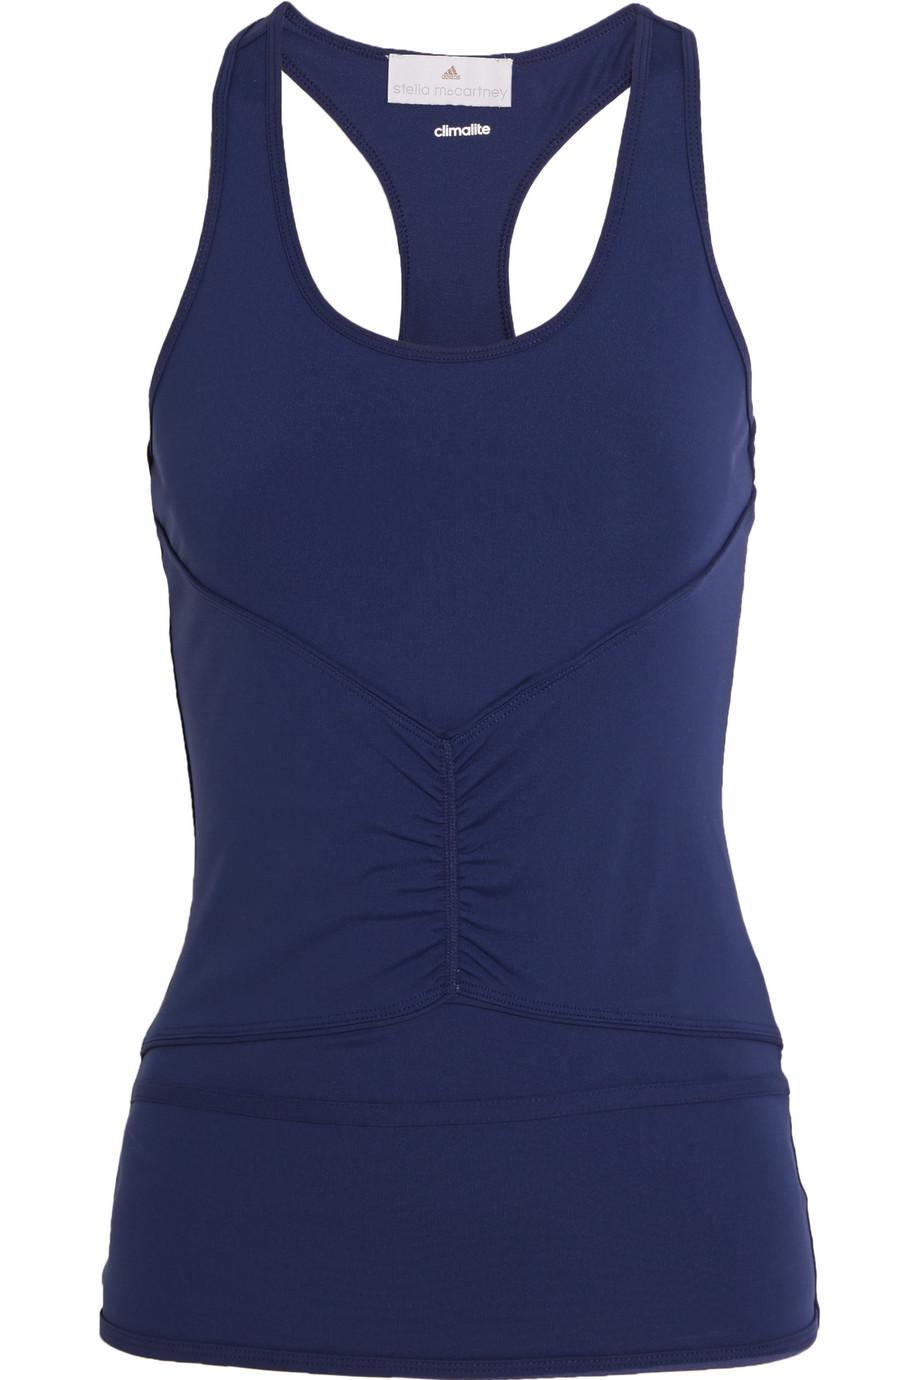 Ruched Climalite Stretch-Jersey Tank, Adidas by Stella Mccartney, Navy, Women's, Size: XS